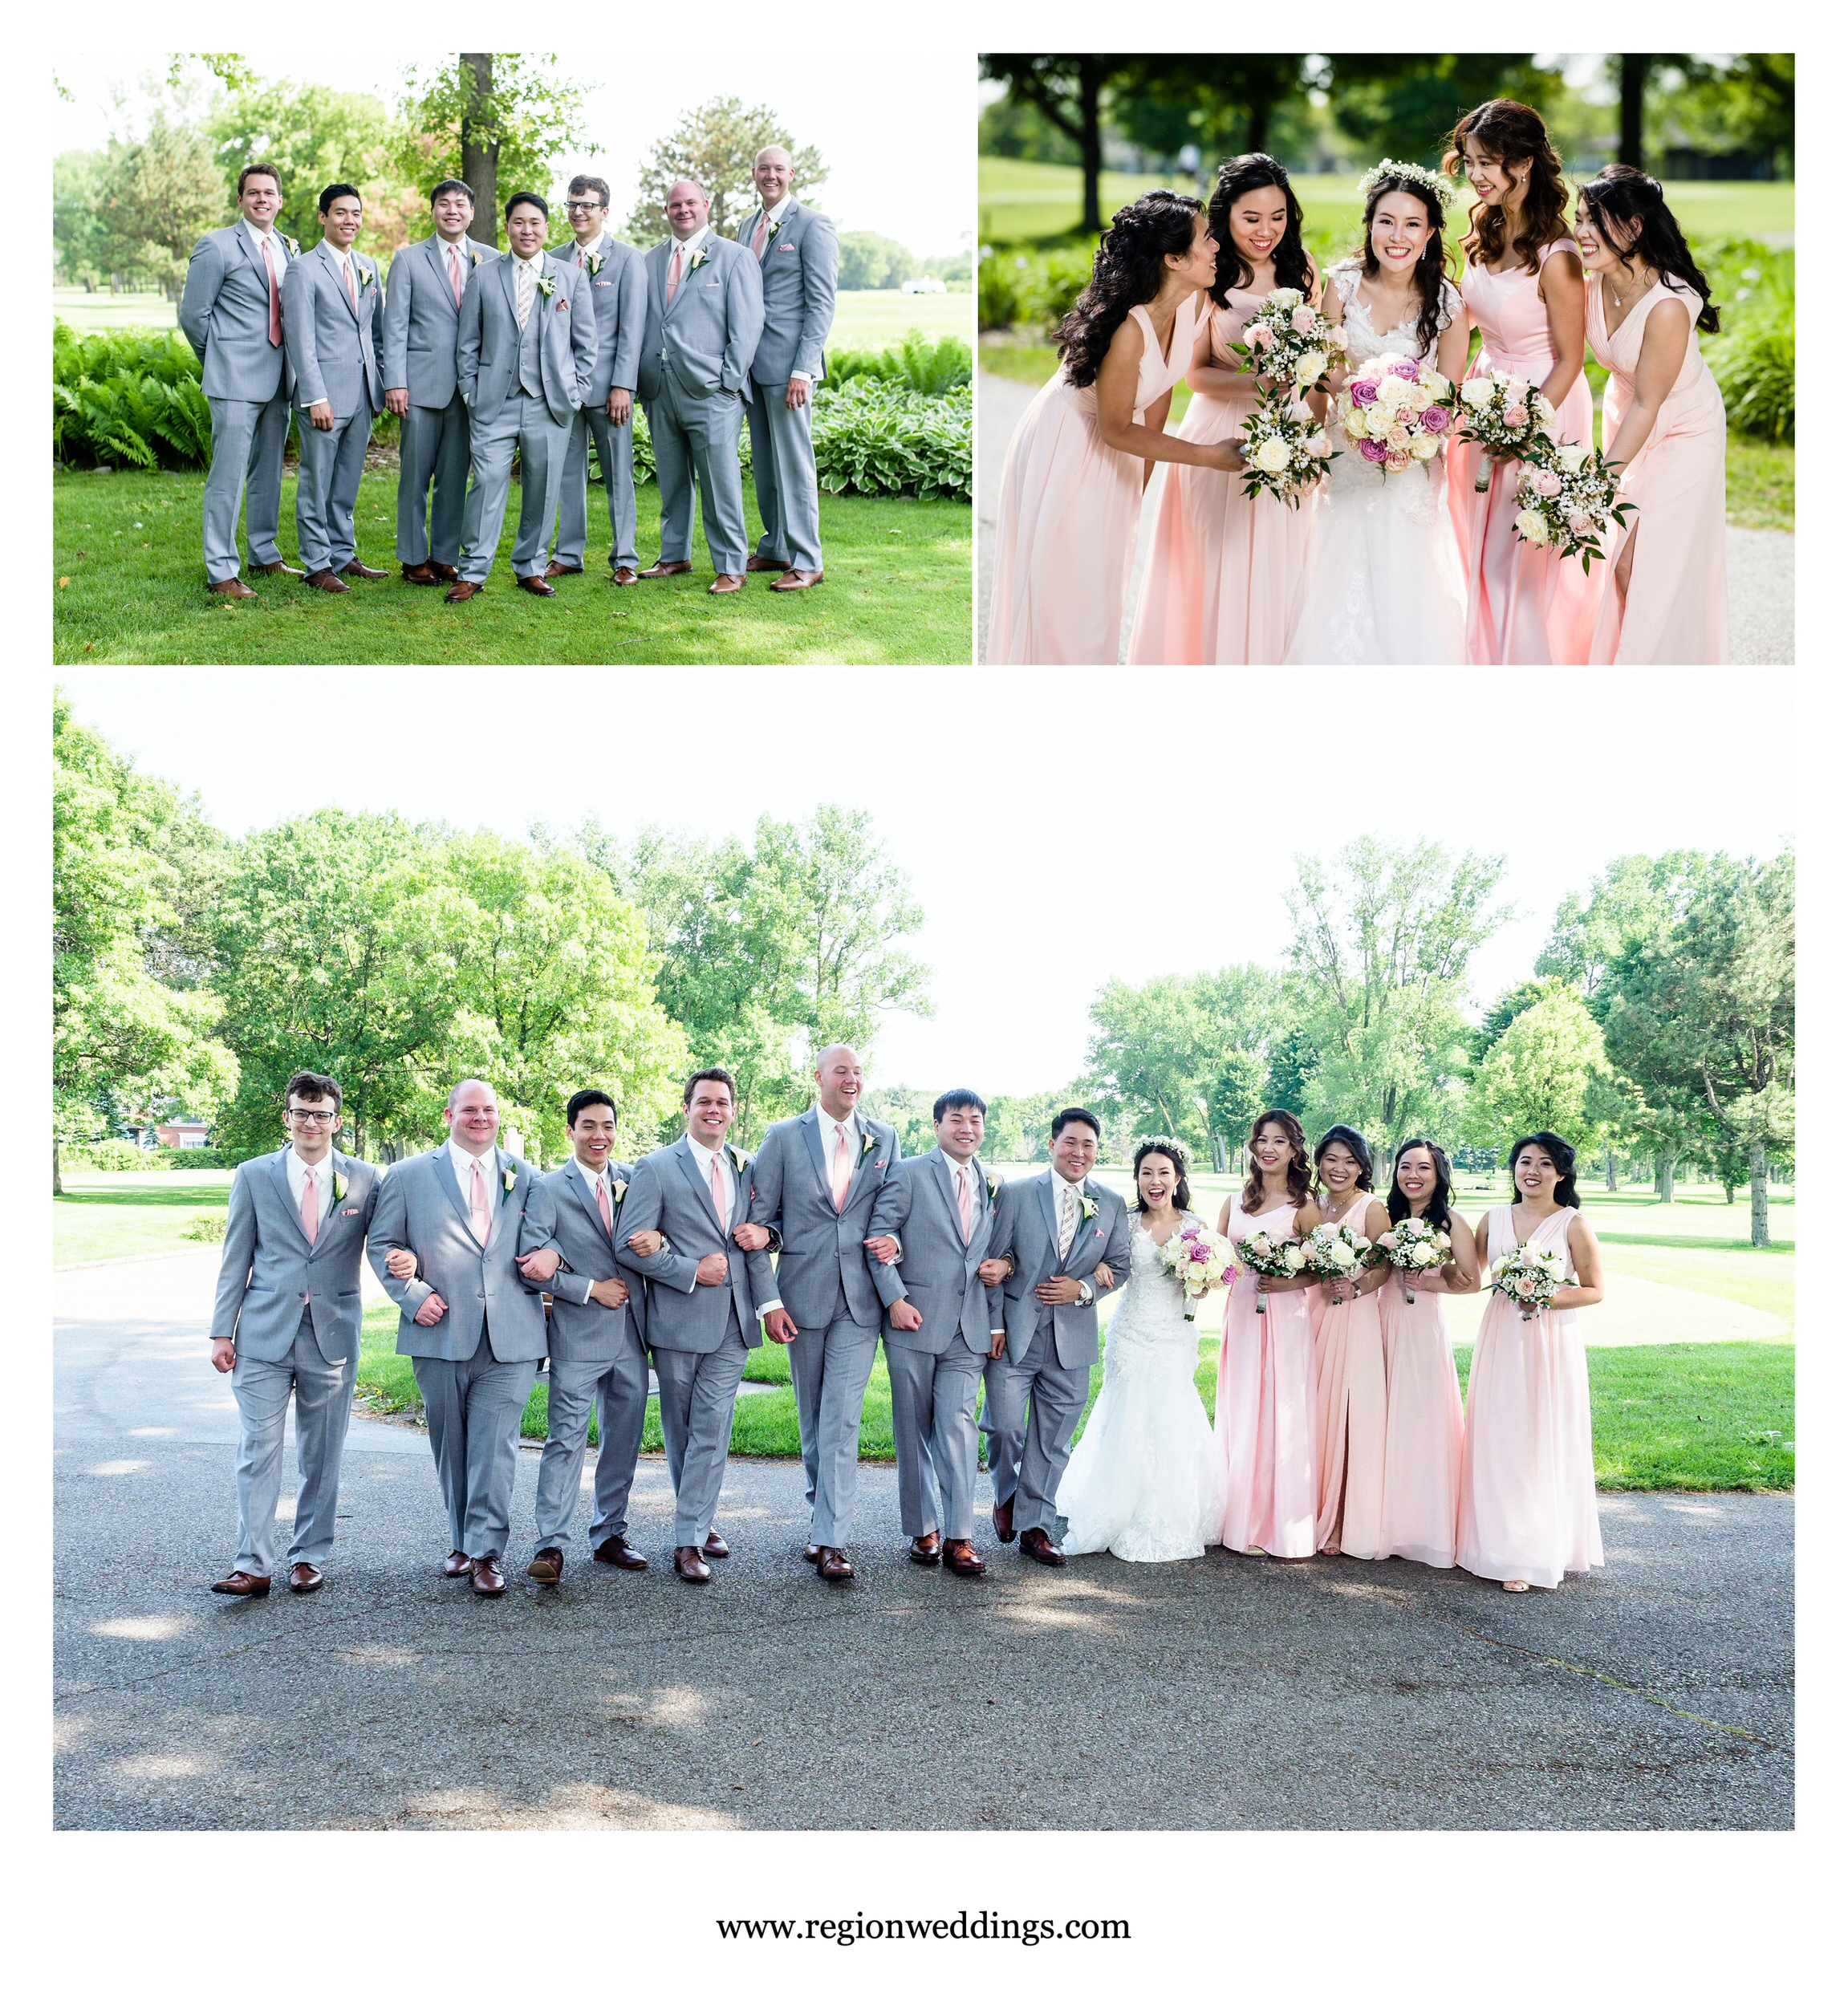 Wedding party group photos at Briar Ridge Country Club.